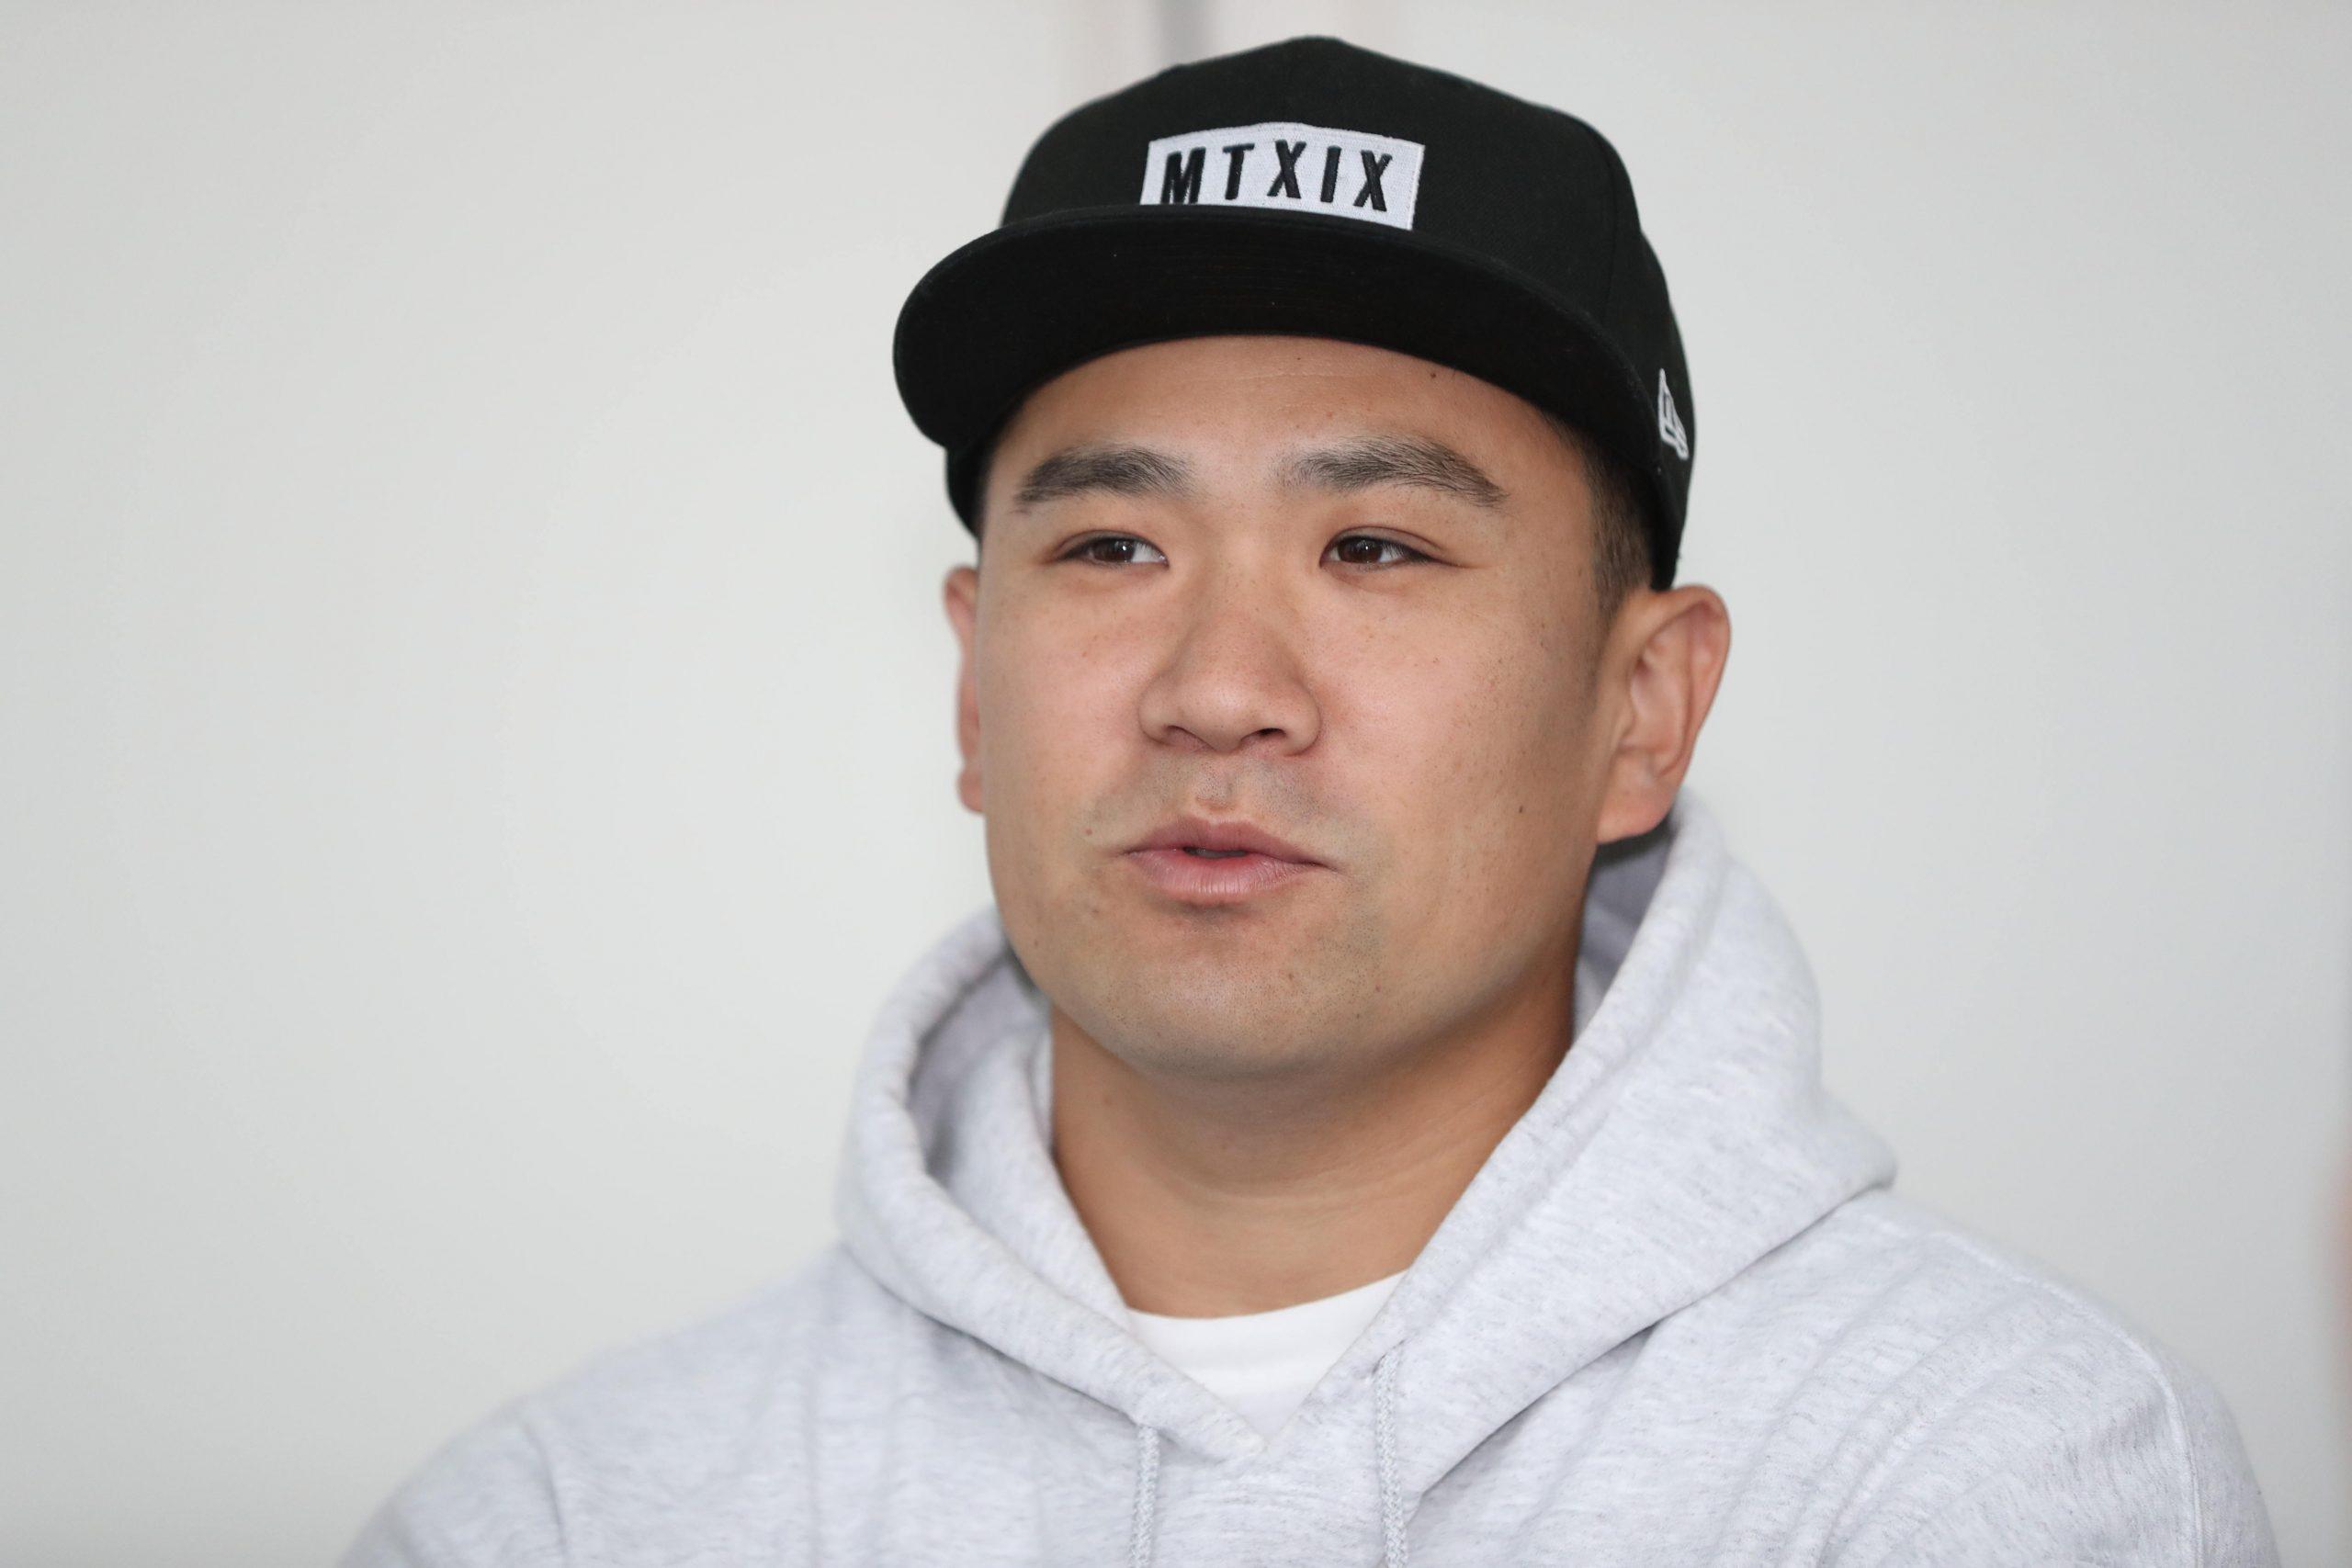 Masahiro Tanaka returns to Japan after 7 seasons with Yankees